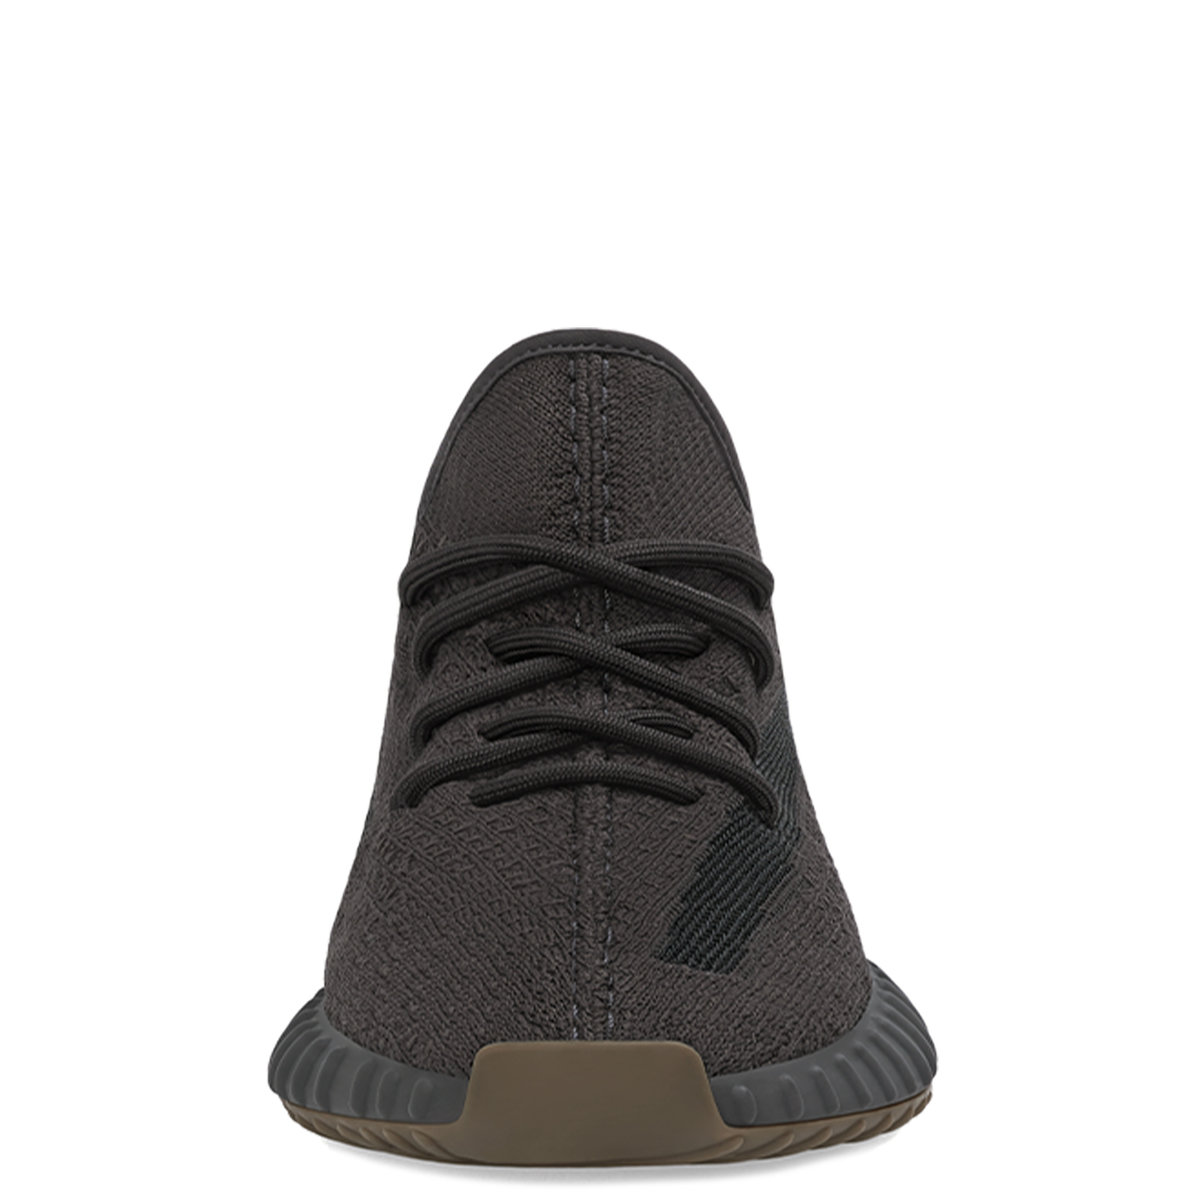 YEEZY BOOST 350 V2 Cinder Sneakers